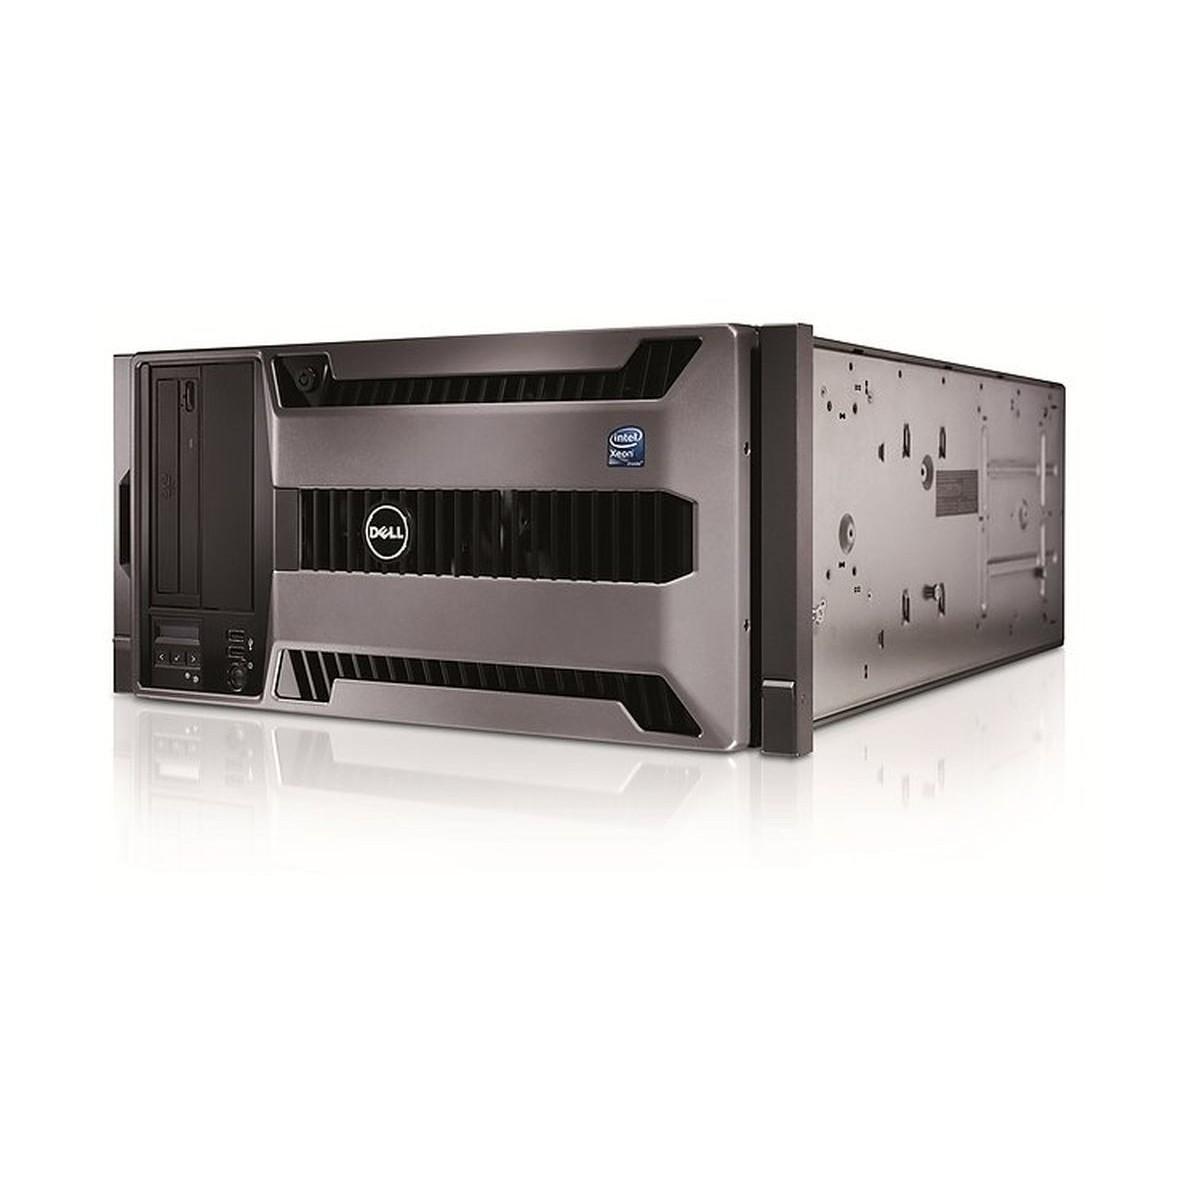 HP ATI FirePRO V5900 2GB GDDR5 PCI-E DVI 2xDP 653328-001